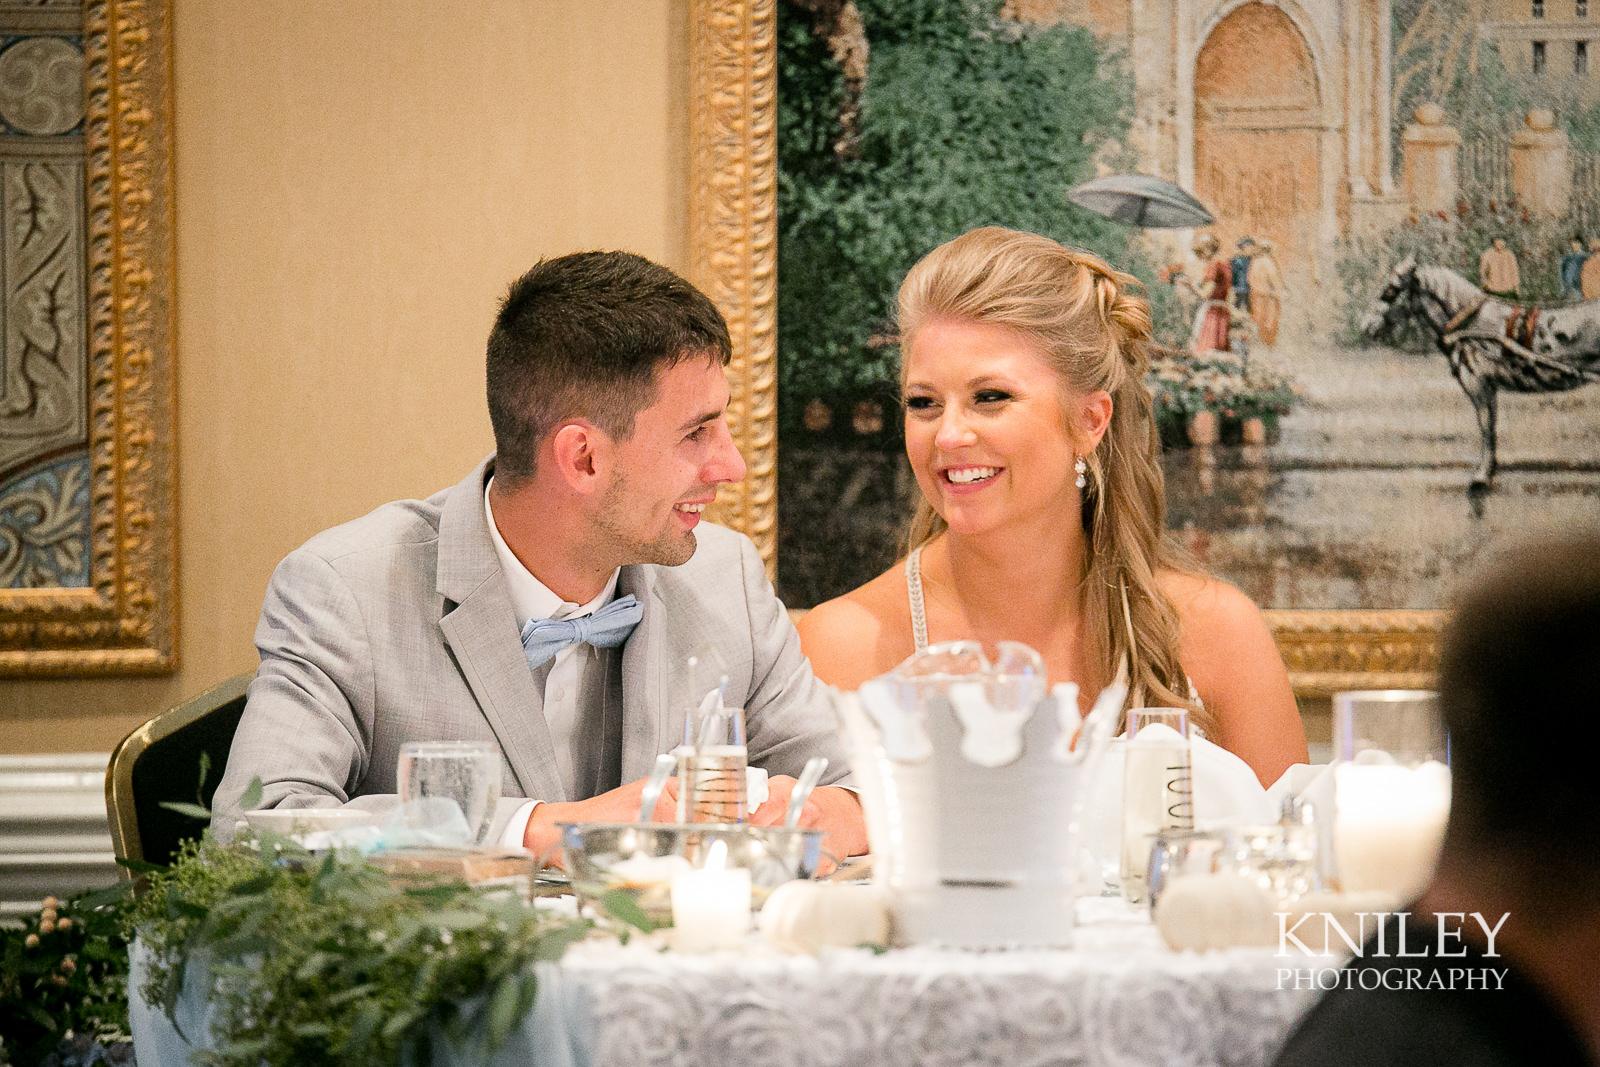 098 - Buffalo NY wedding pictures - Sean Patrick Restaurant Wedding Reception - Getzville - IMG_8475.jpg